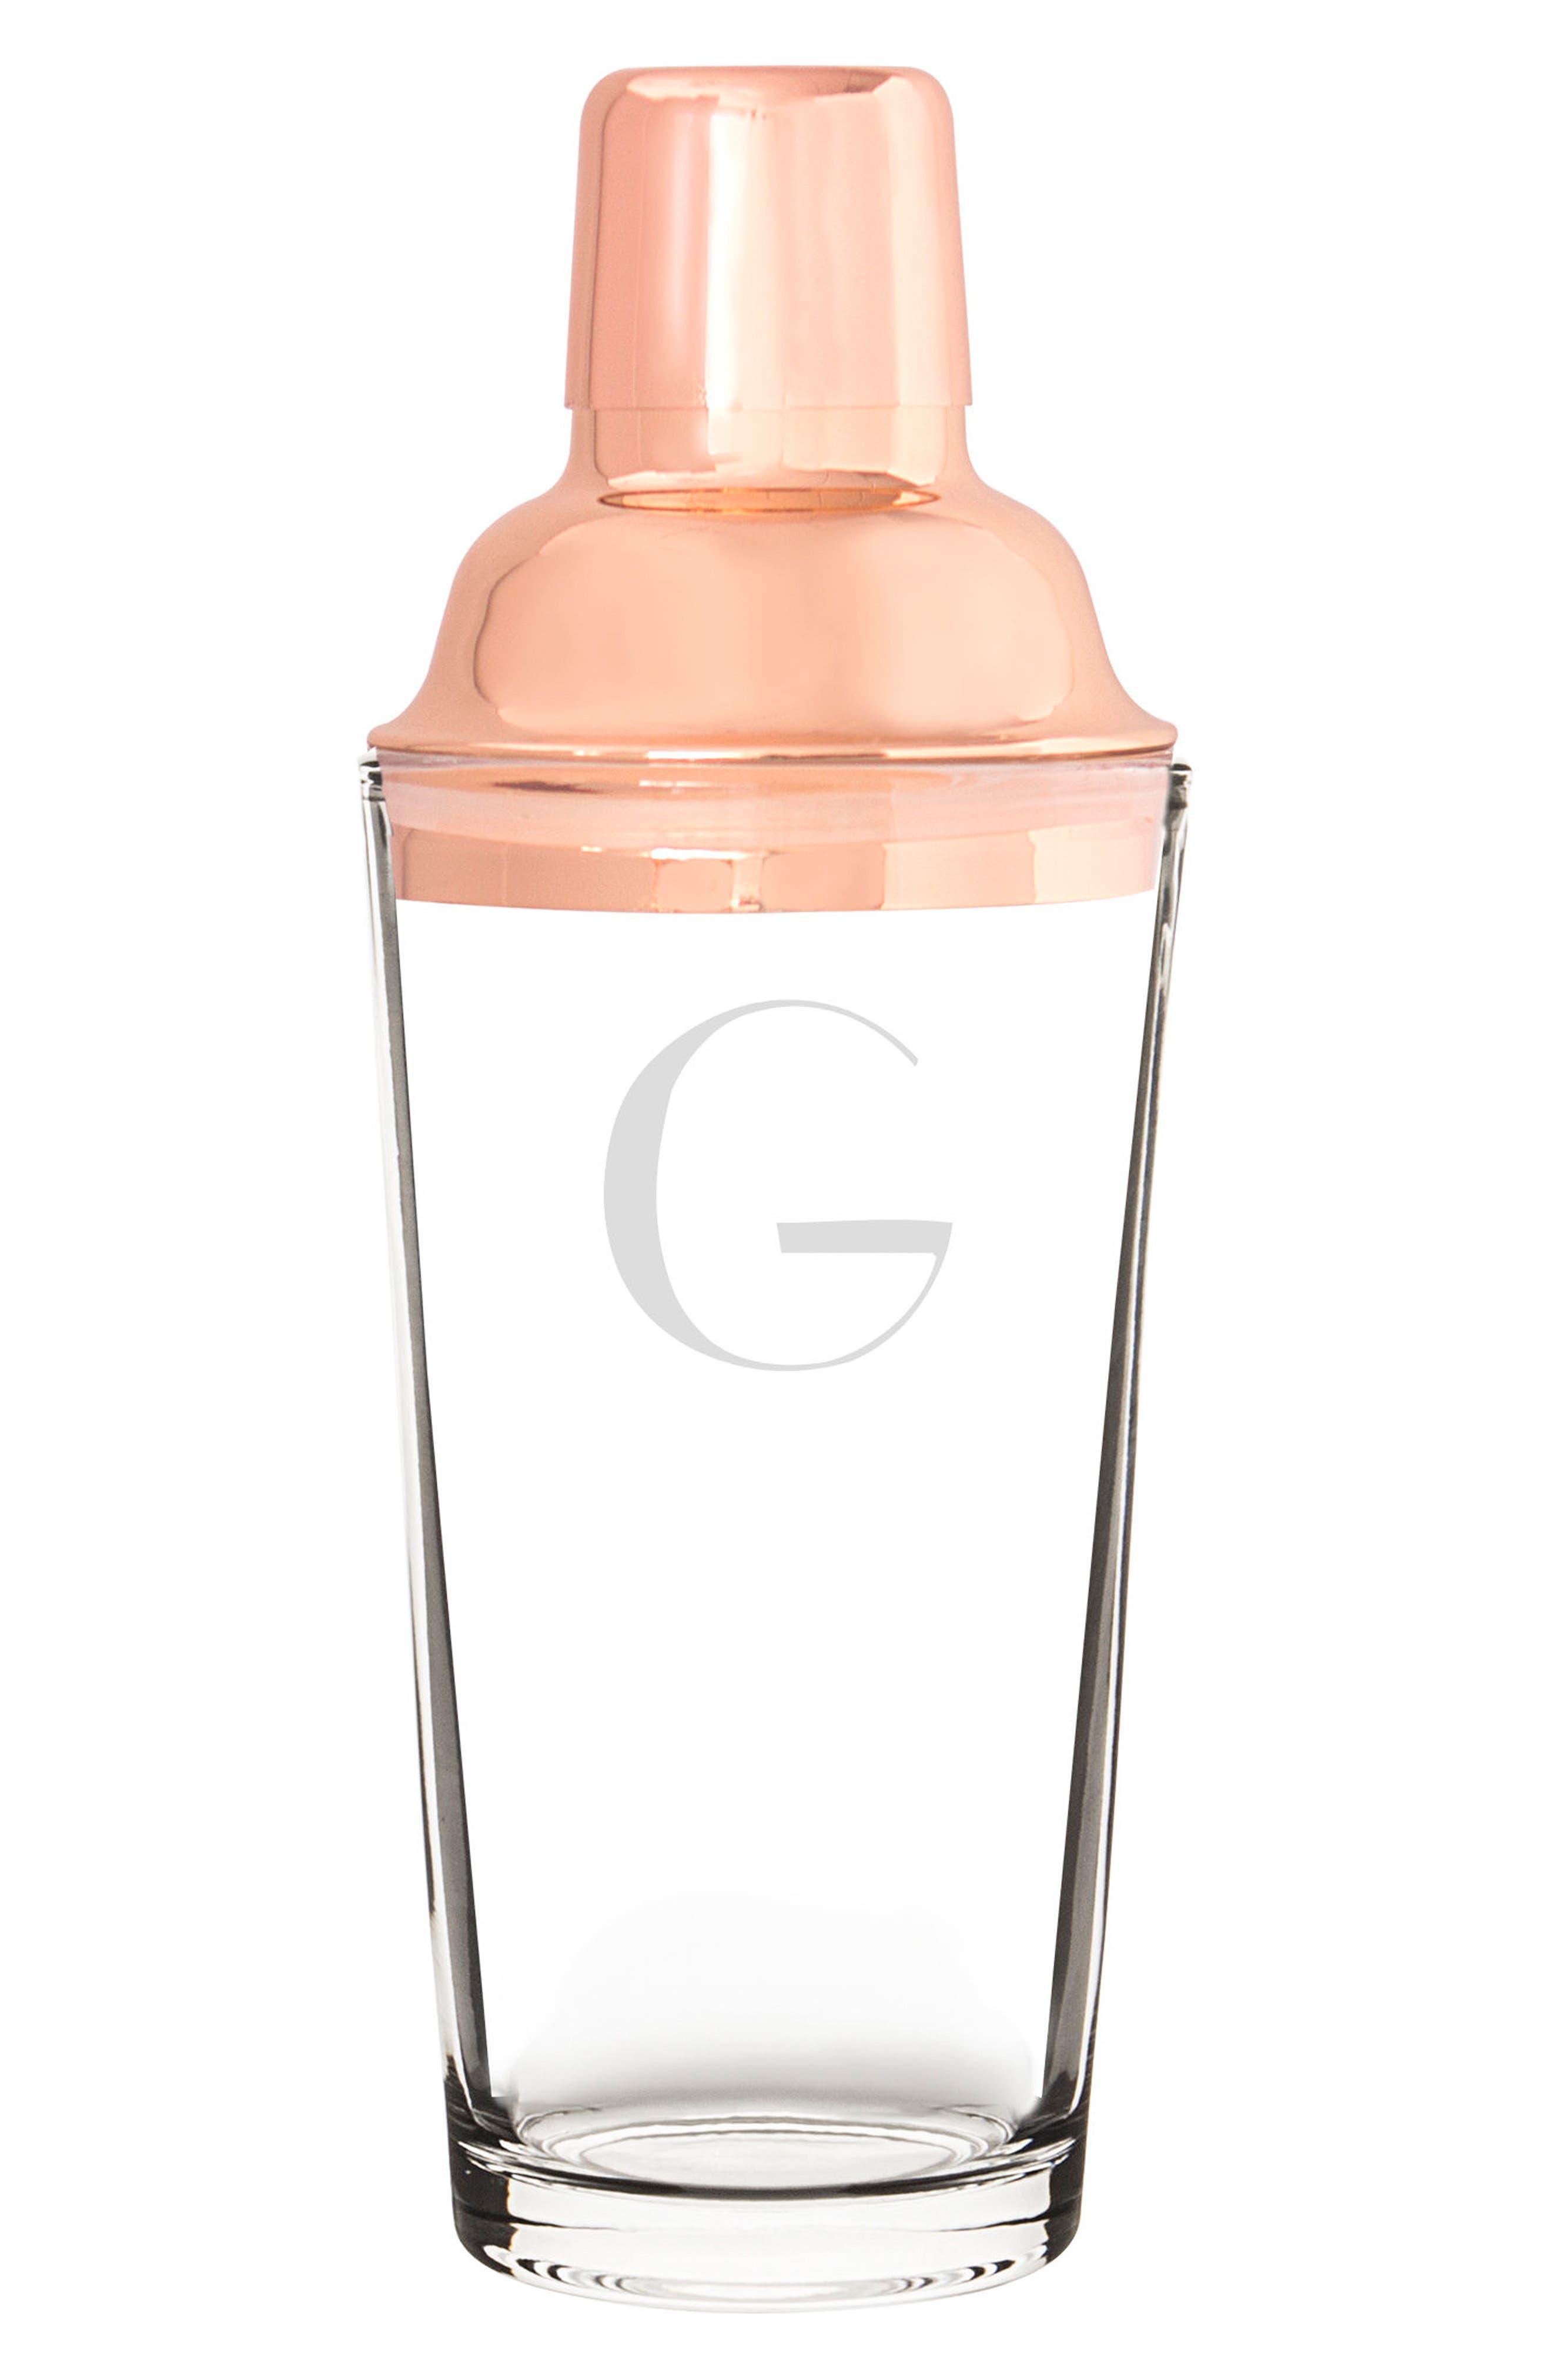 Monogram Coppertone Cocktail Shaker,                             Alternate thumbnail 28, color,